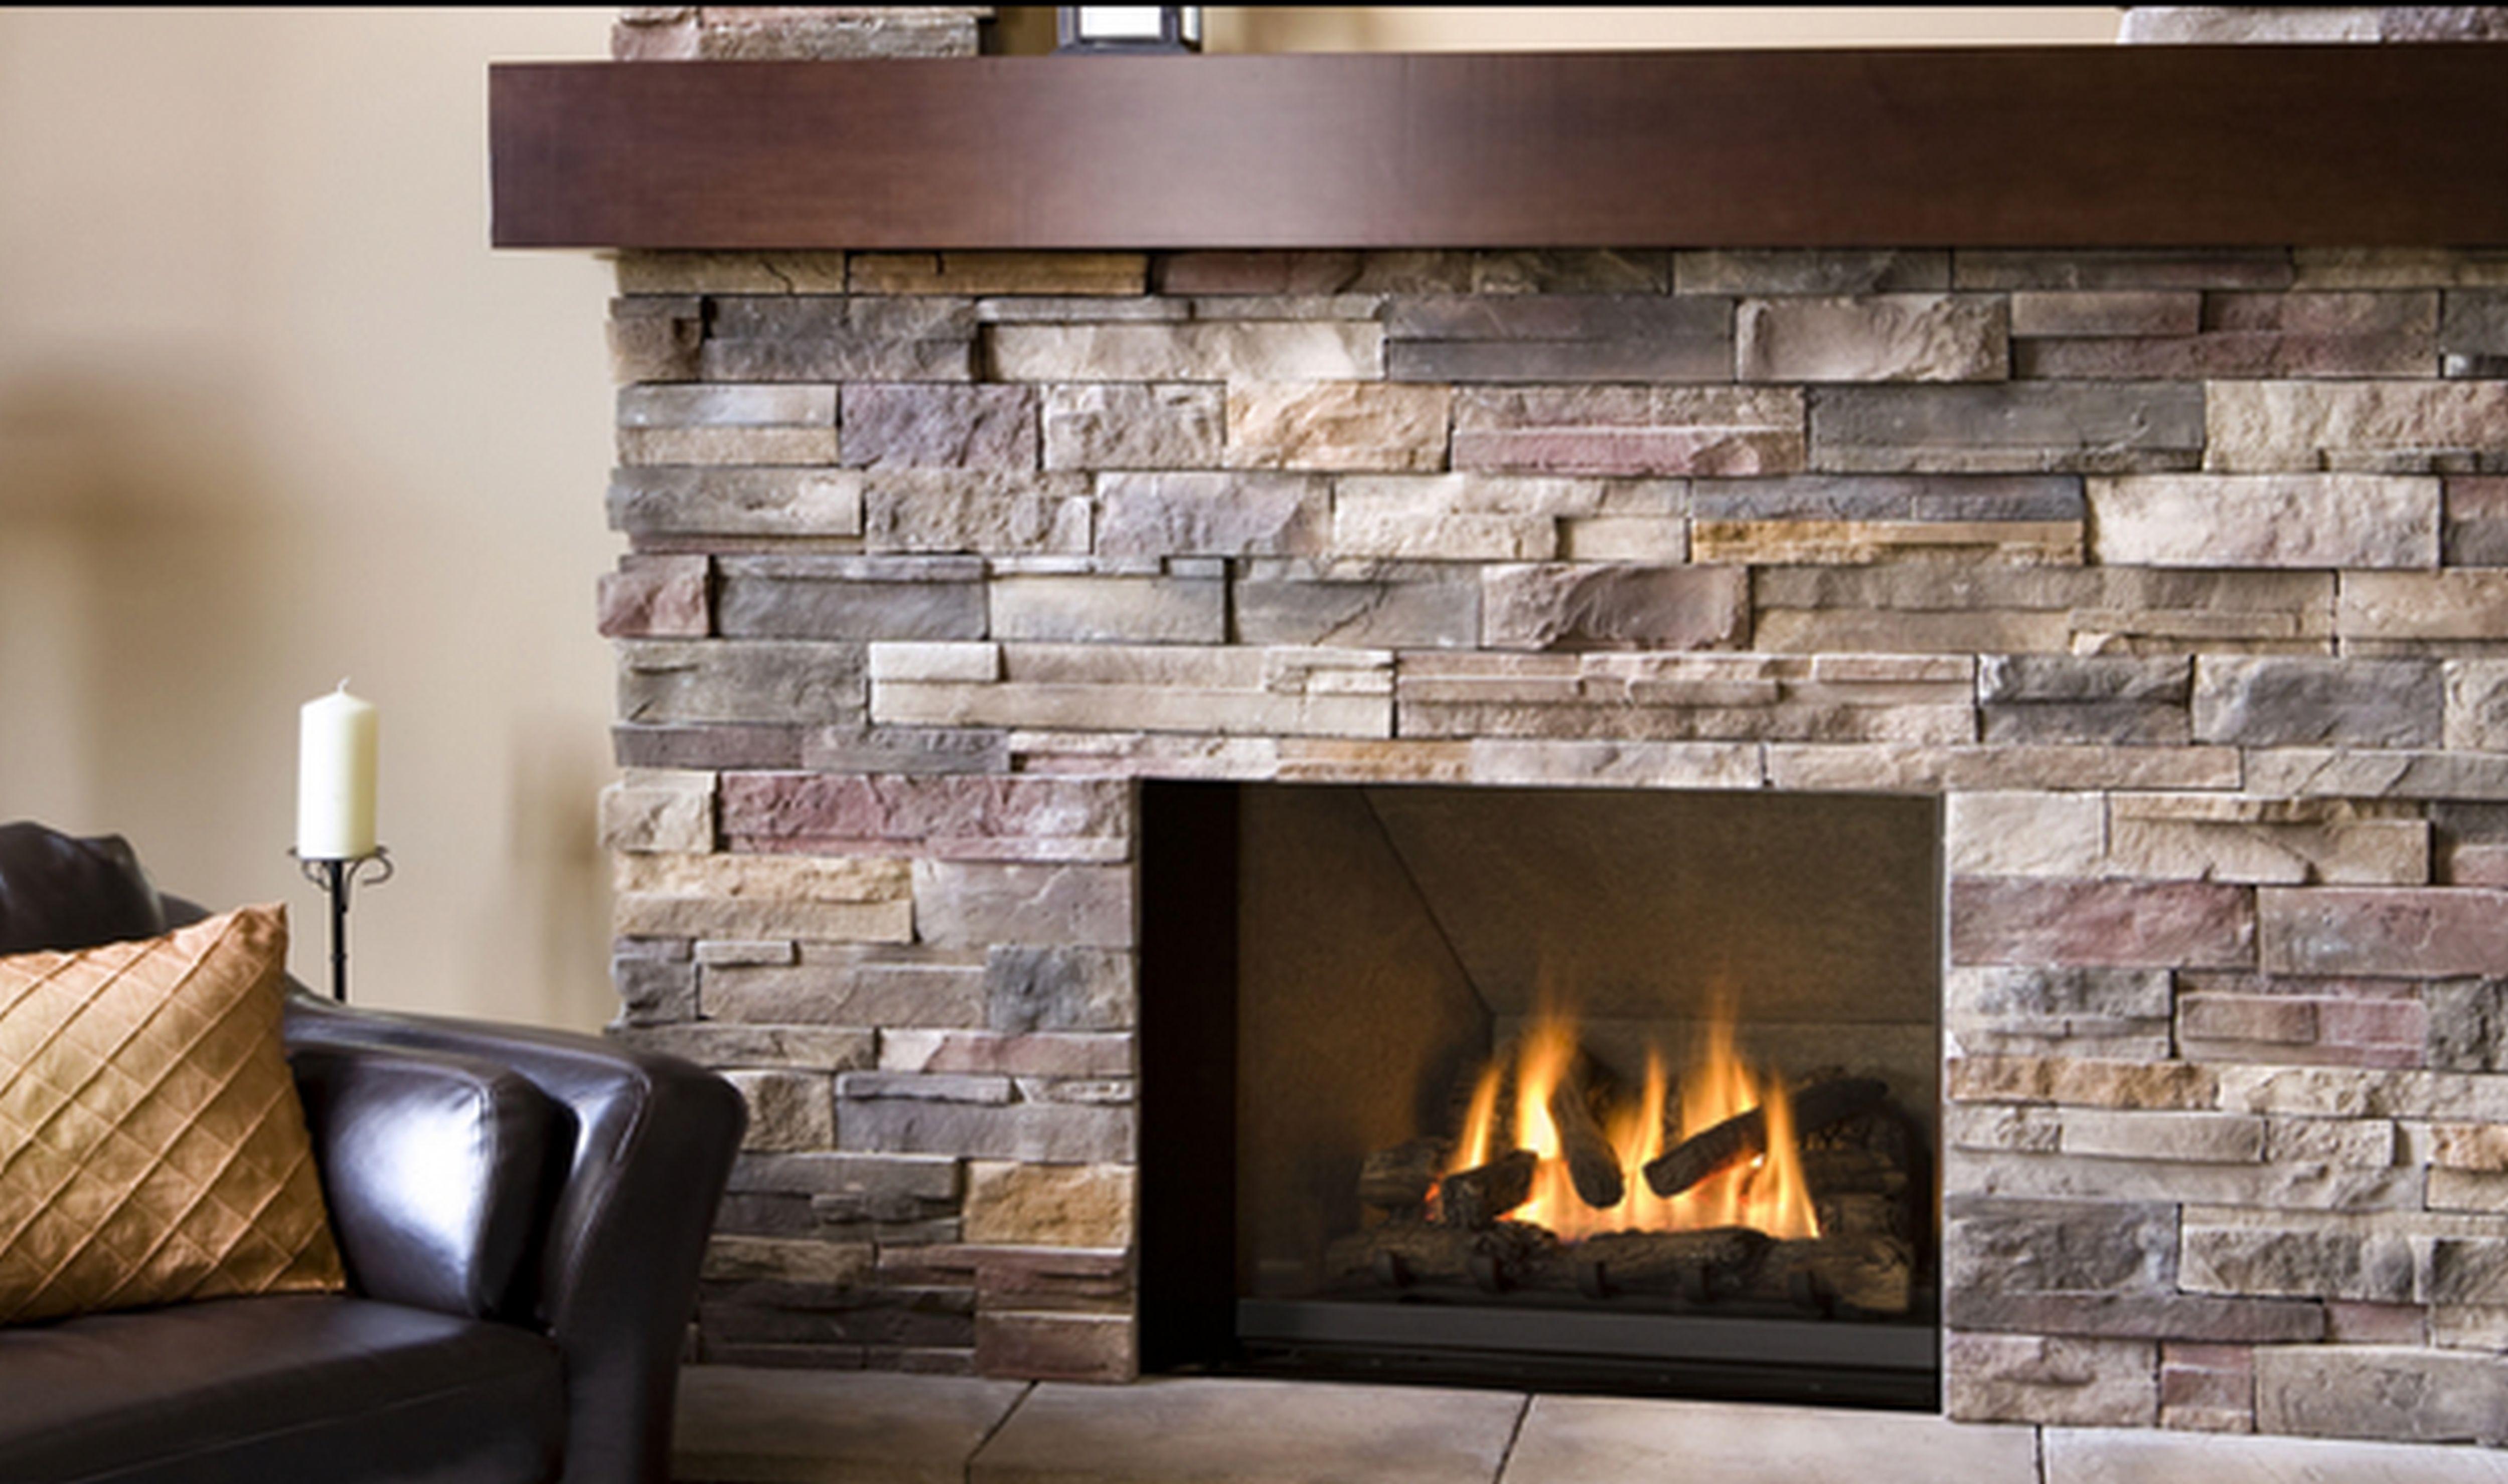 Diy faux stone fireplace fireplace design ideas for Diy rock wall fireplace